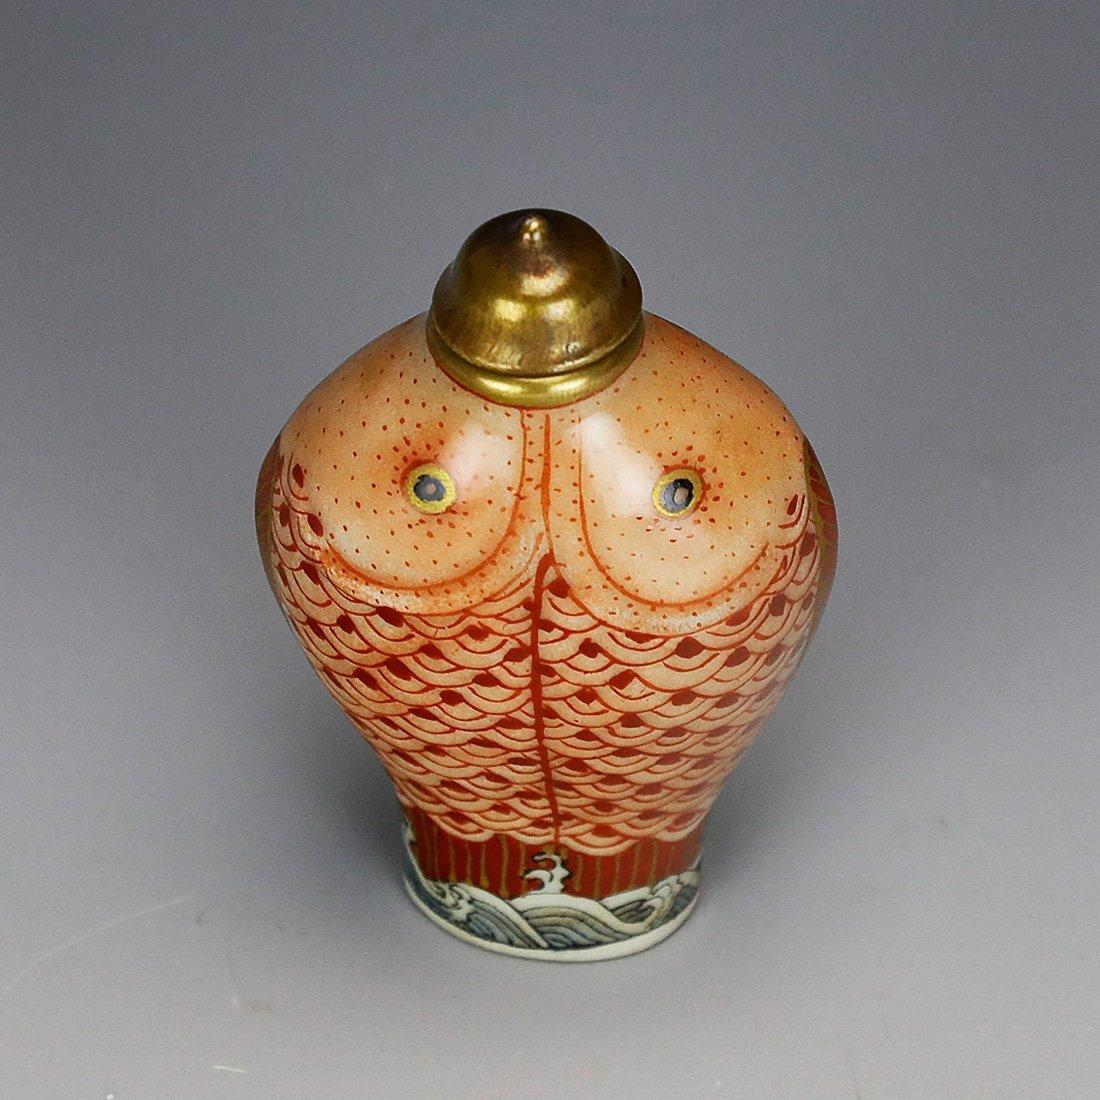 Qianlong ceramic snuff box Hand painted gold 18 century - 8